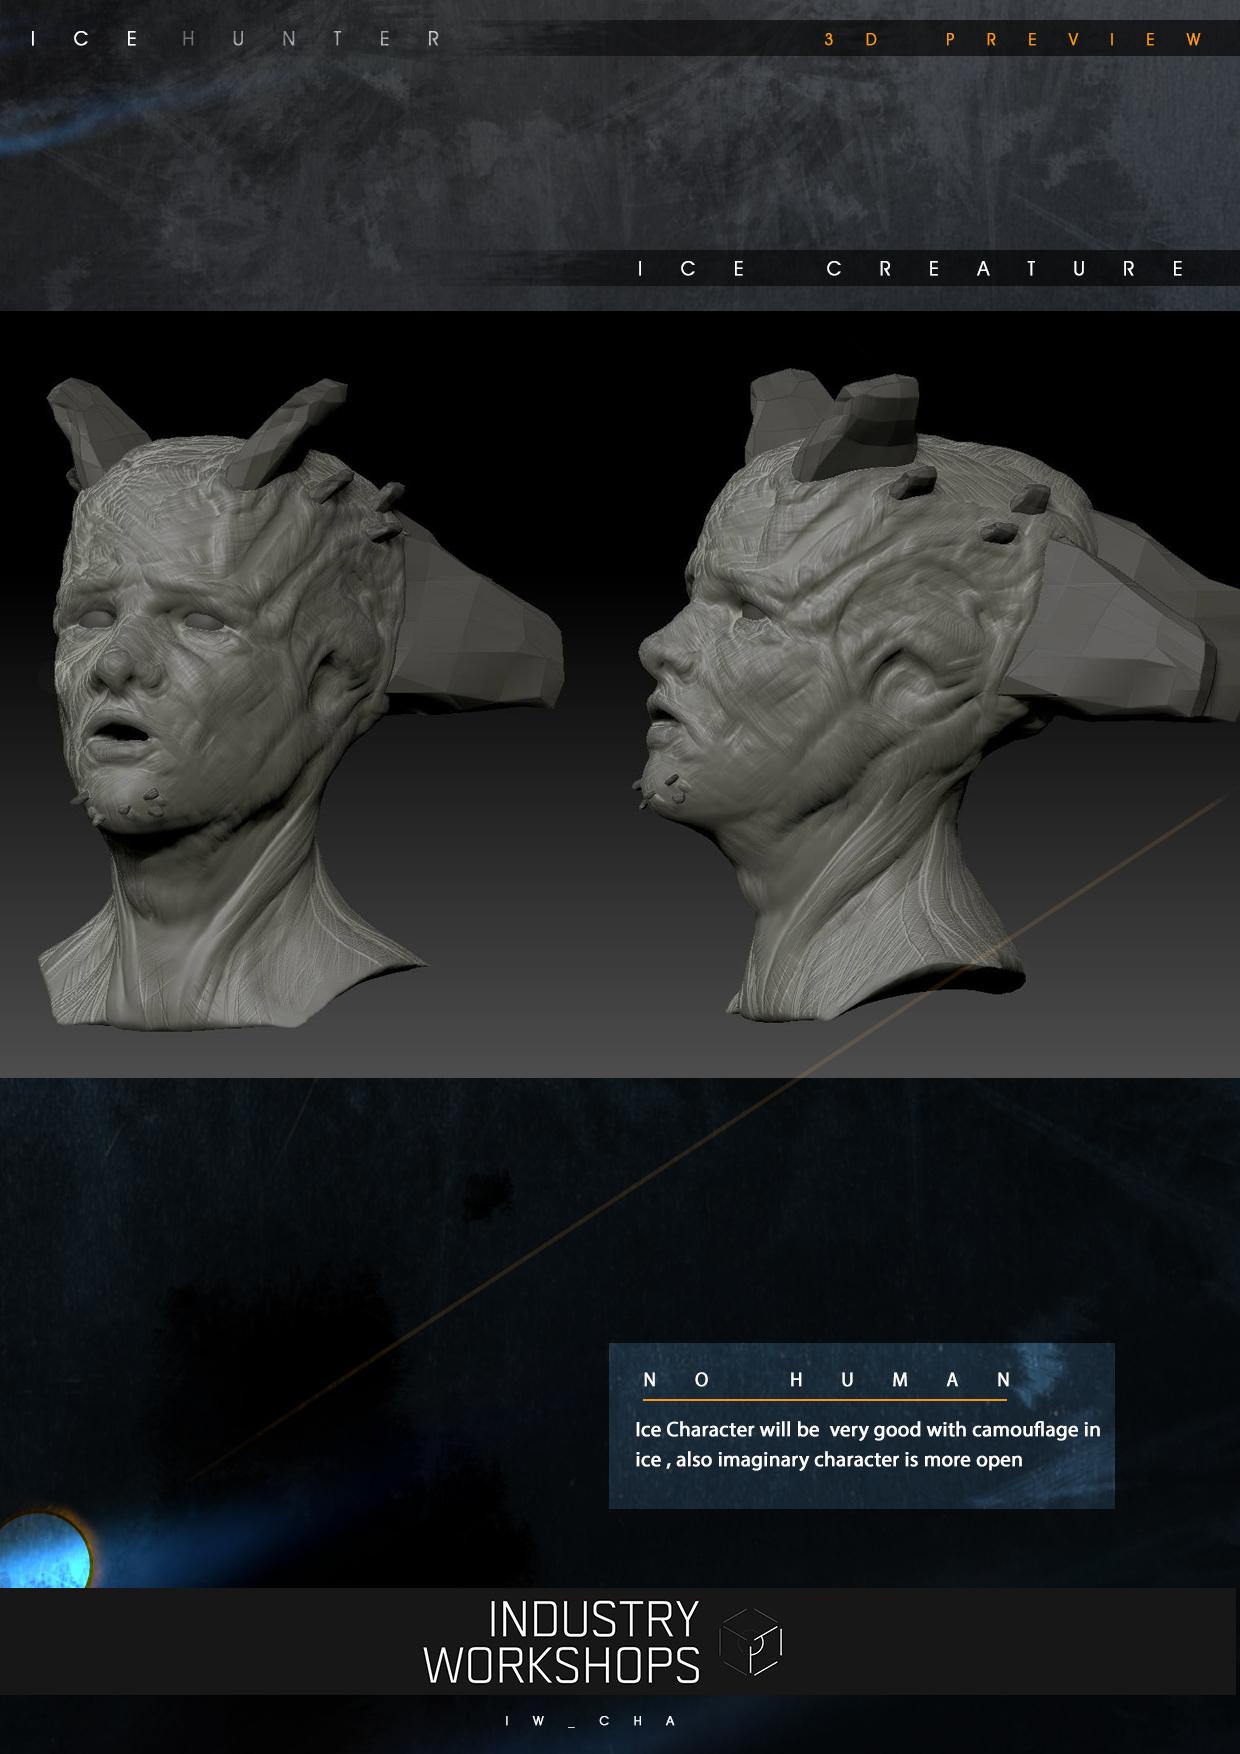 07 3Dpreview.jpg